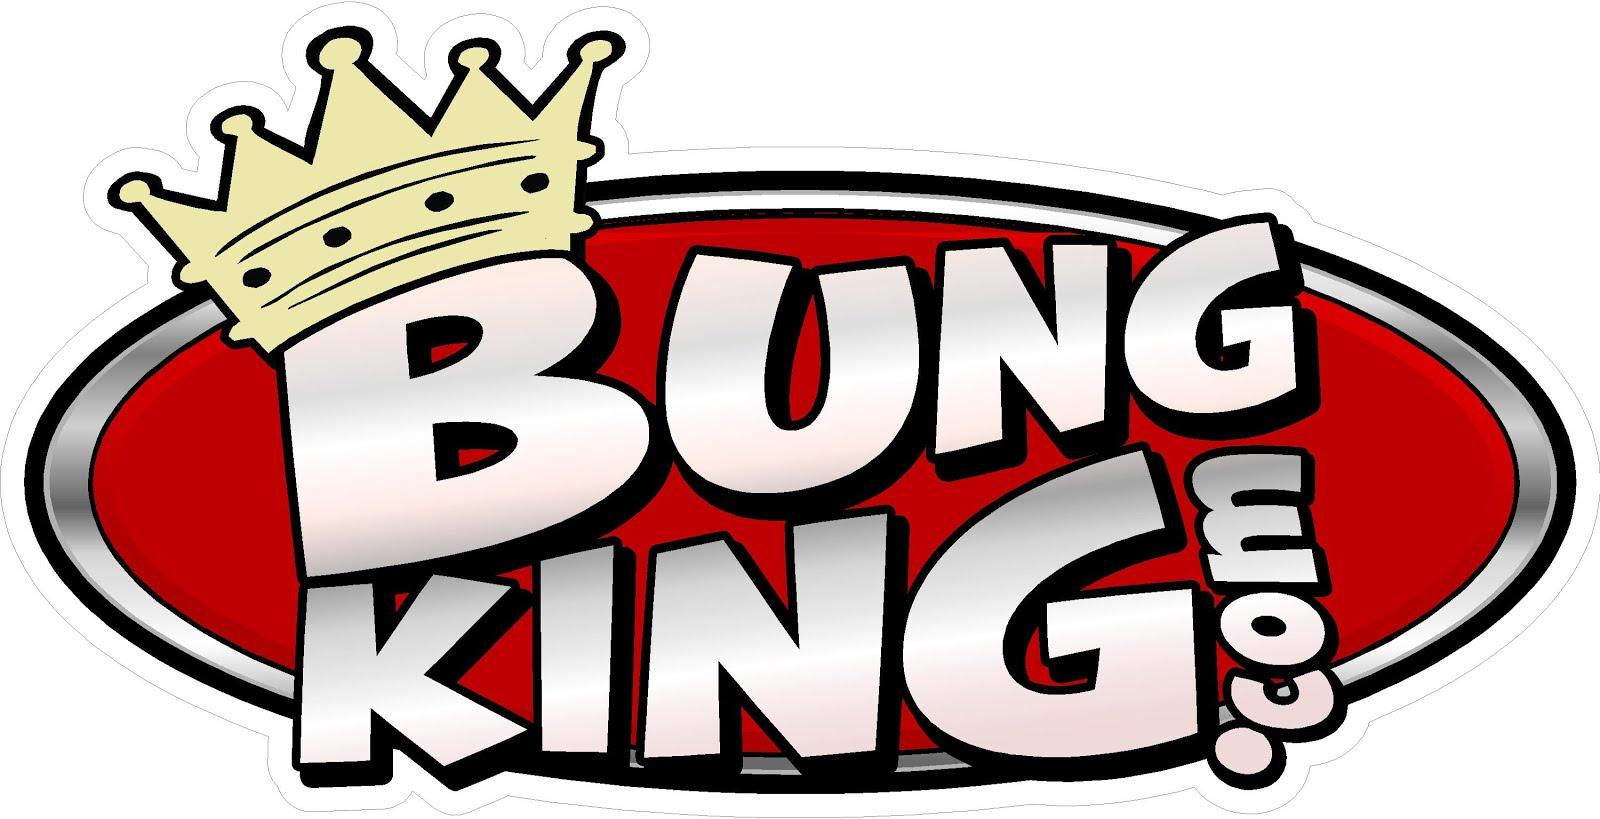 Bung King